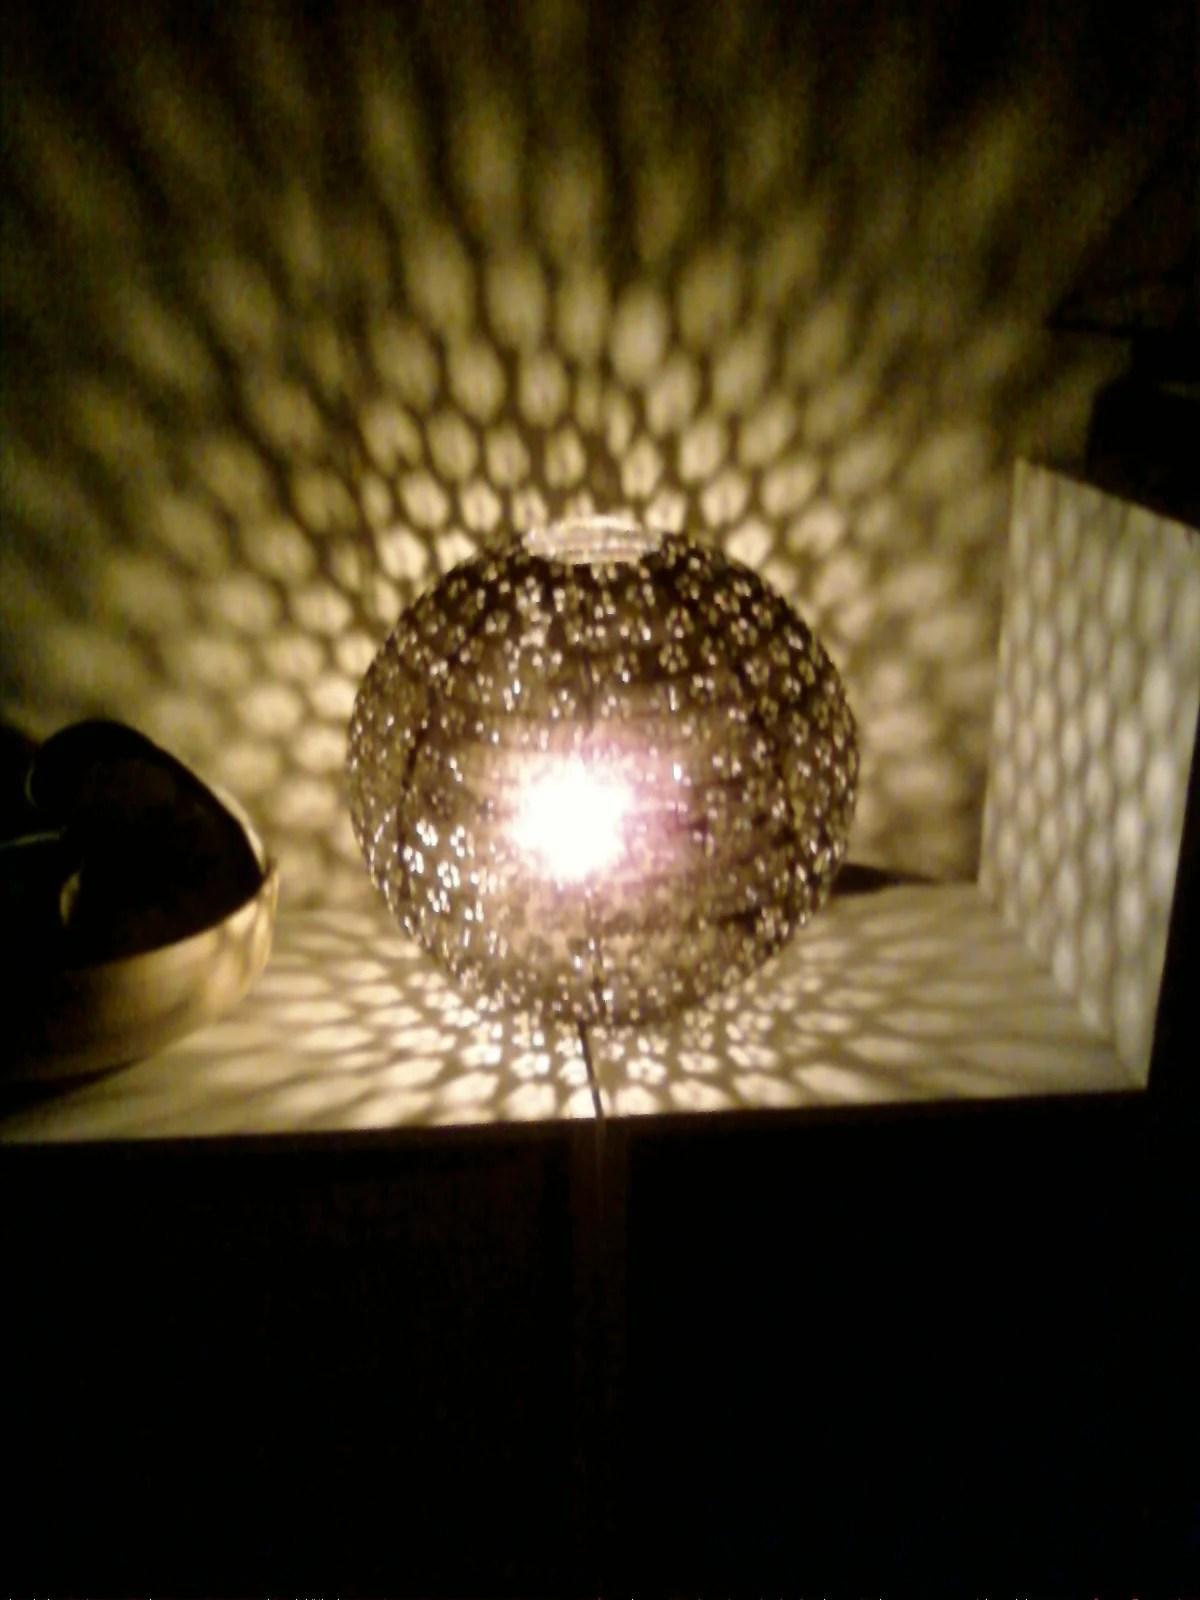 ikea regolit night light ikea hackers